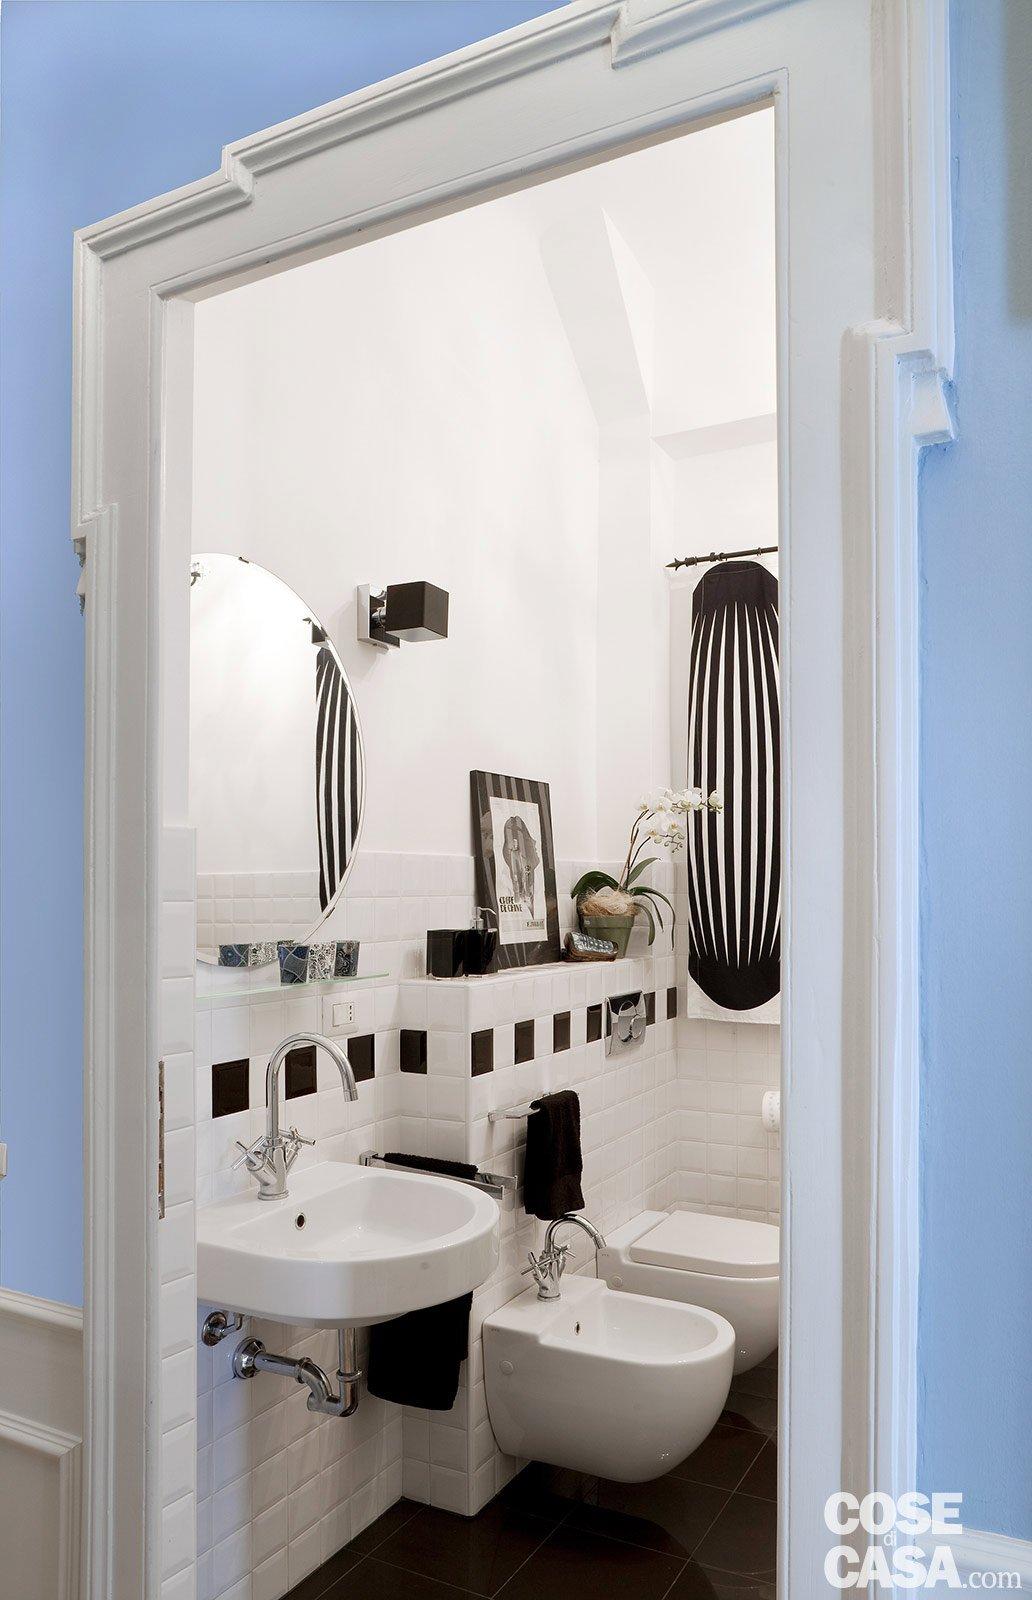 La casa per due un bilocale di classe cose di casa - Sanitari bagno ikea ...